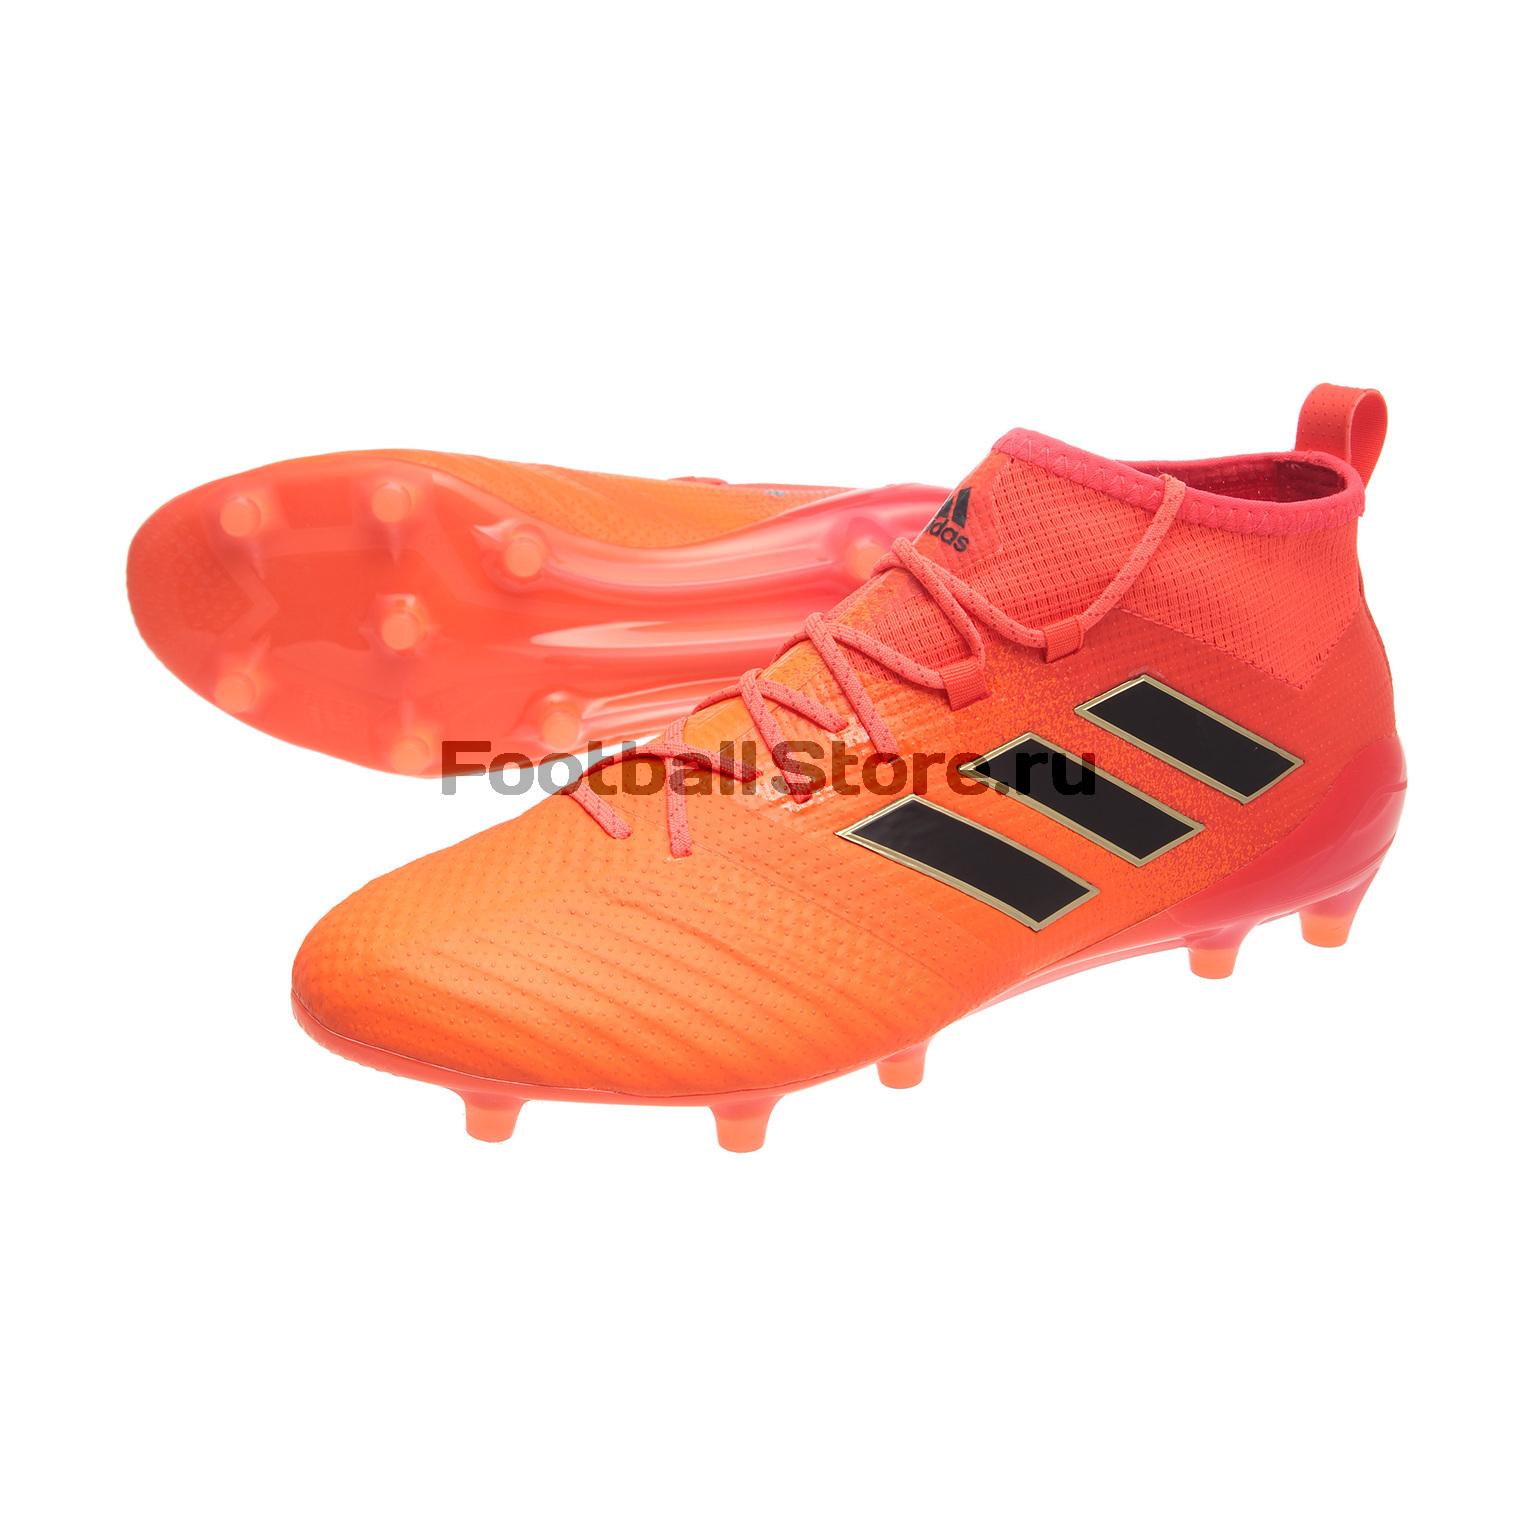 Игровые бутсы Adidas Бутсы Adidas Ace 17.1 FG S77036